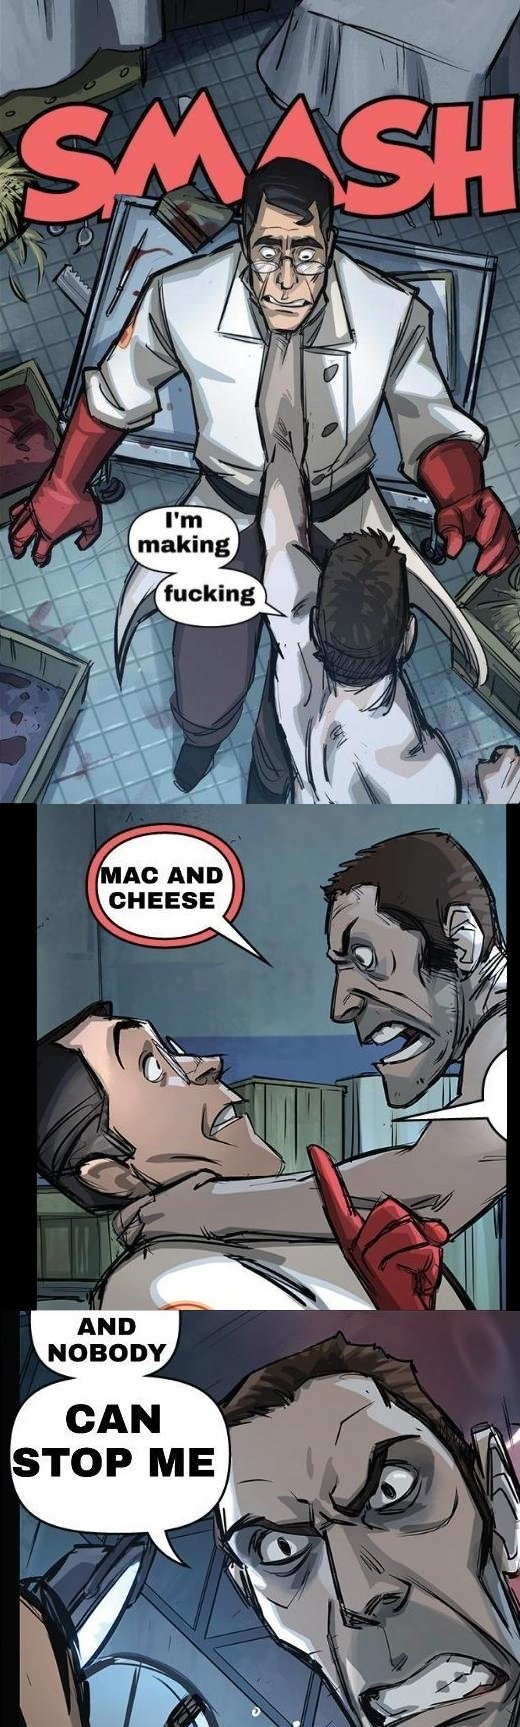 Mac n cheese - meme